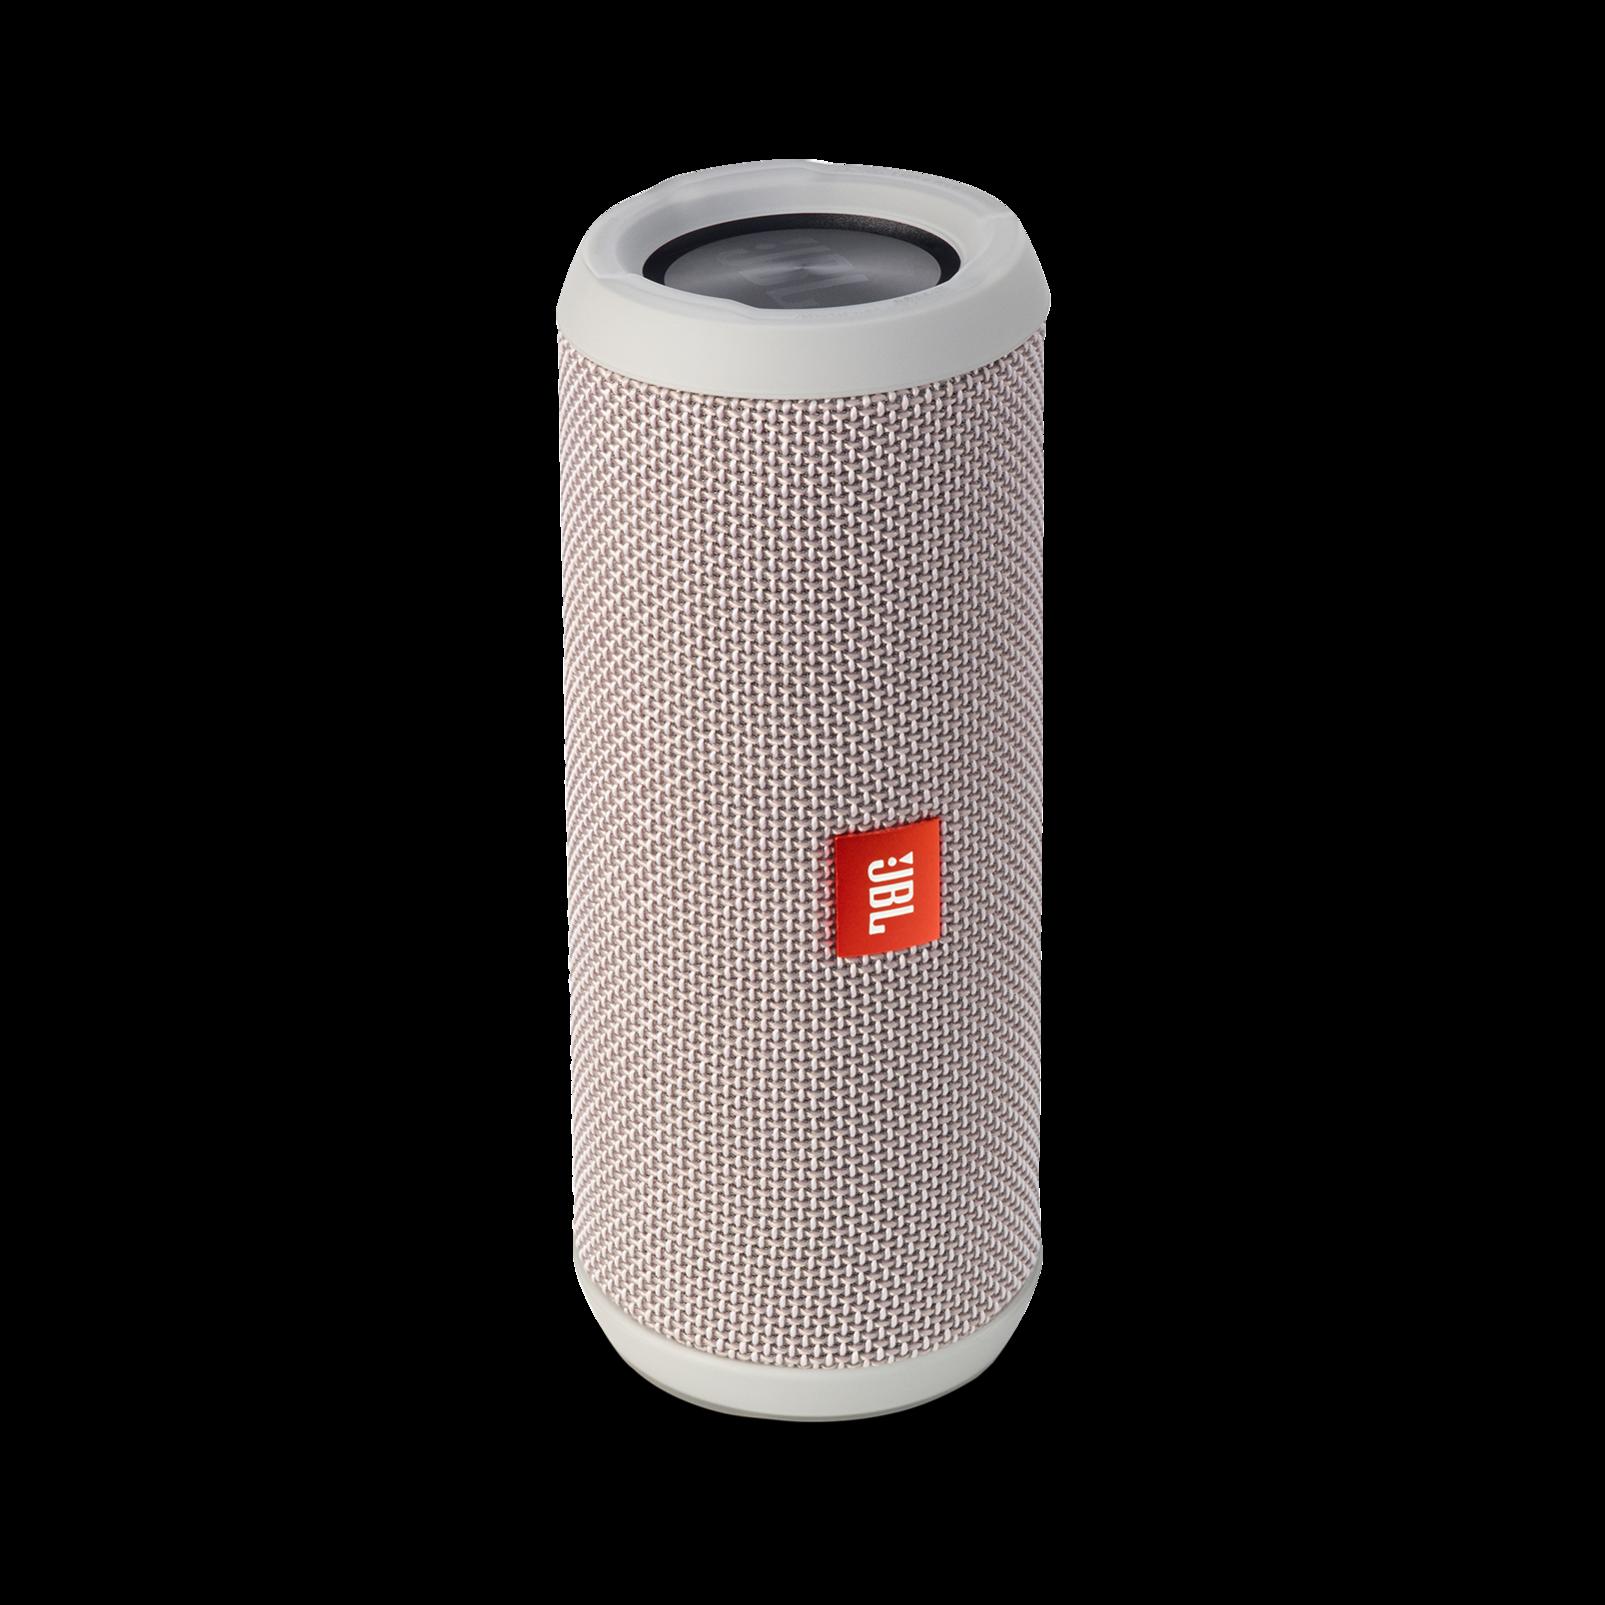 JBL Flip 3 - Grey - Splashproof portable Bluetooth speaker with powerful sound and speakerphone technology - Detailshot 2